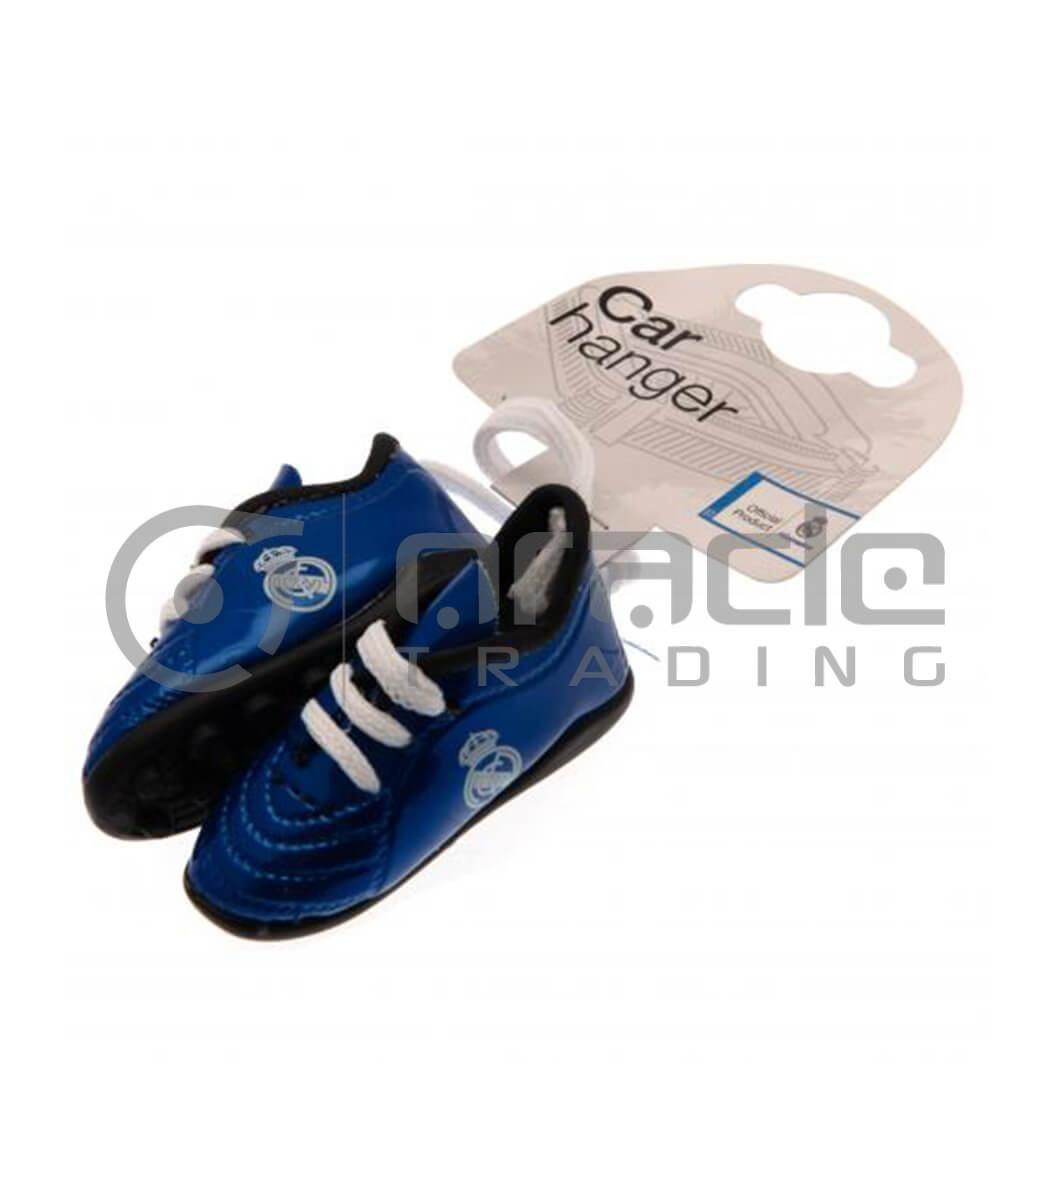 Real Madrid Shoe Hangers